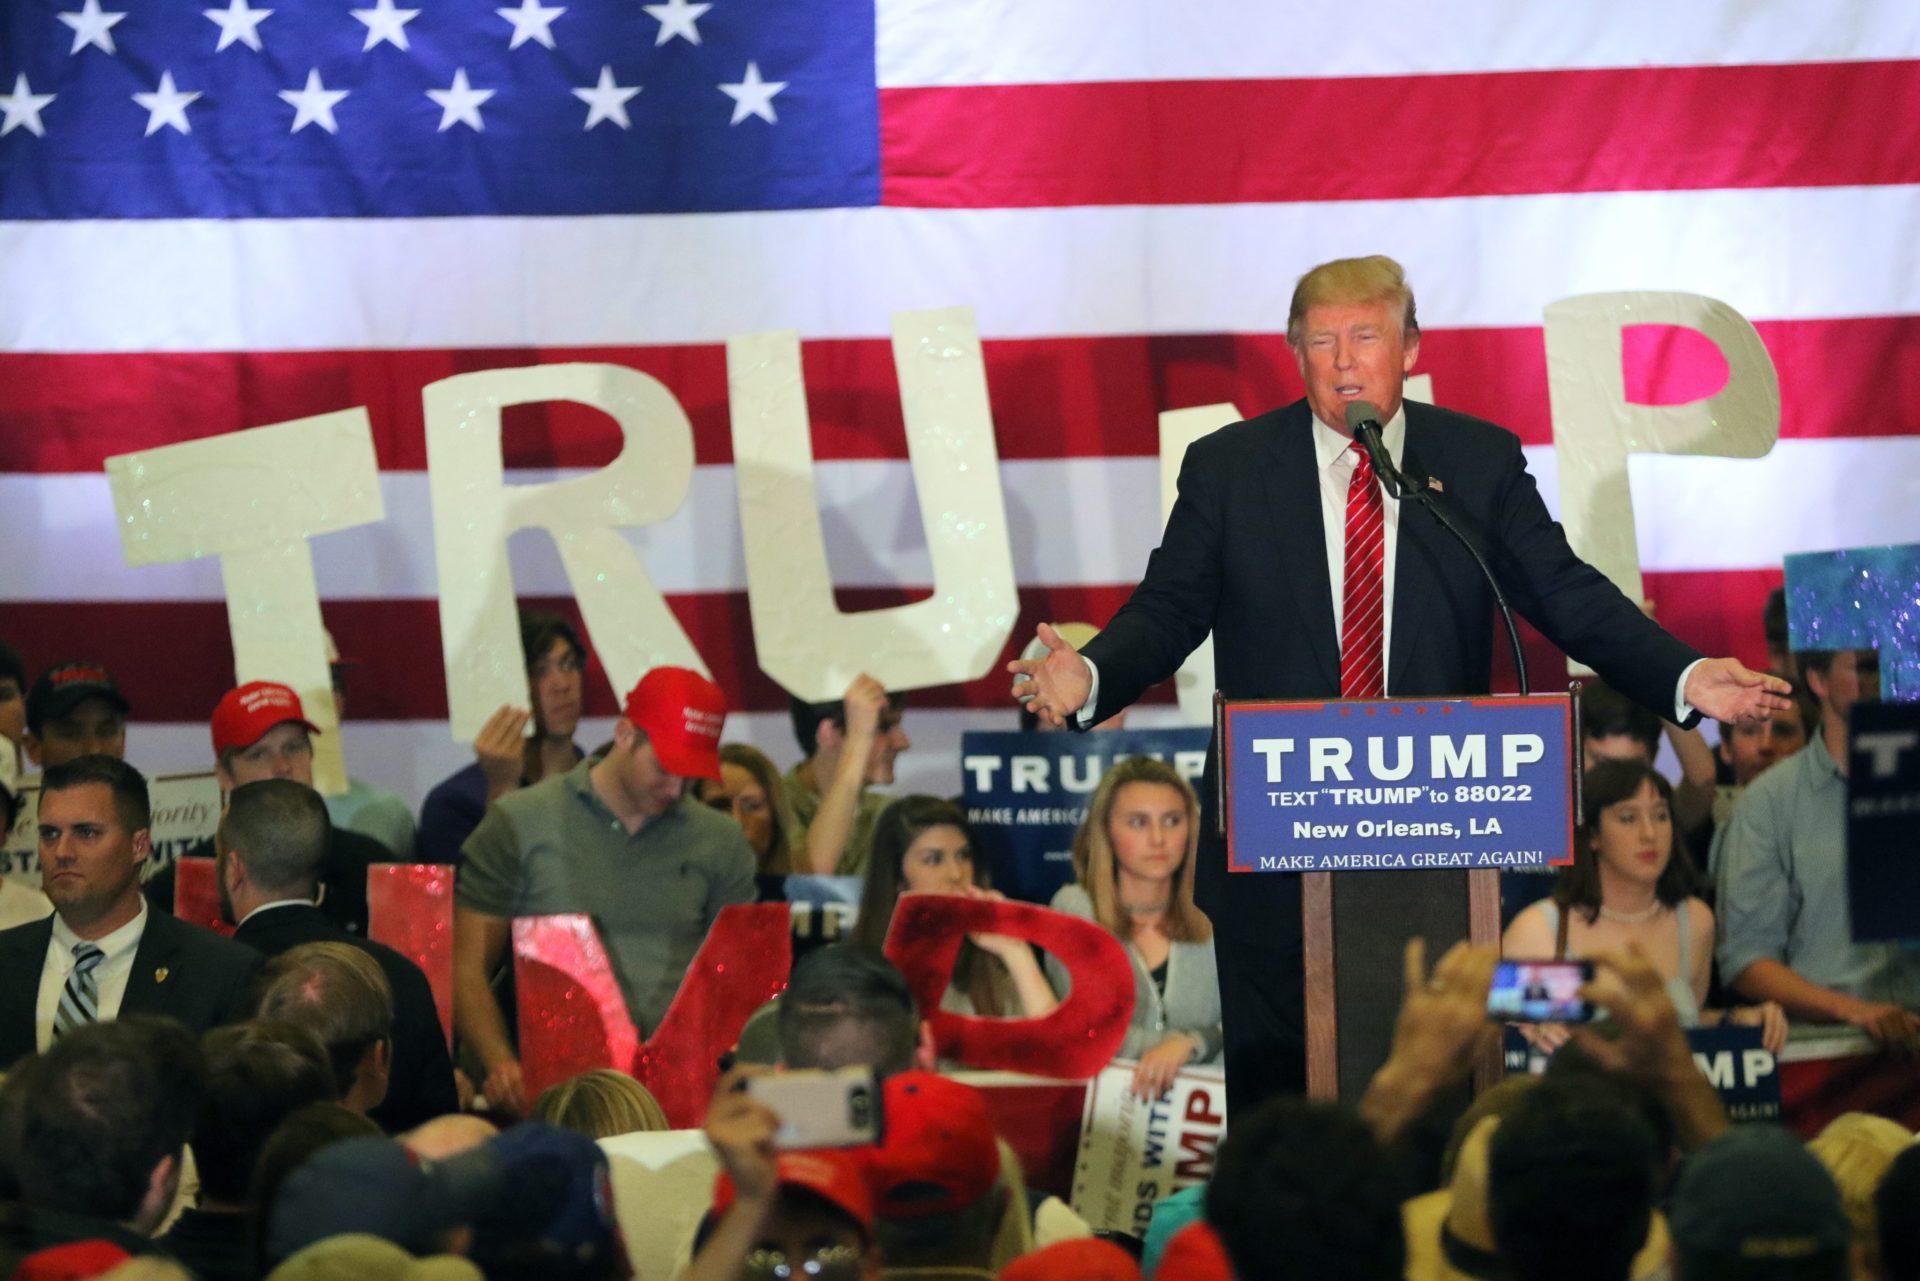 Donald Trump campaigns in New Orleans, Louisiana